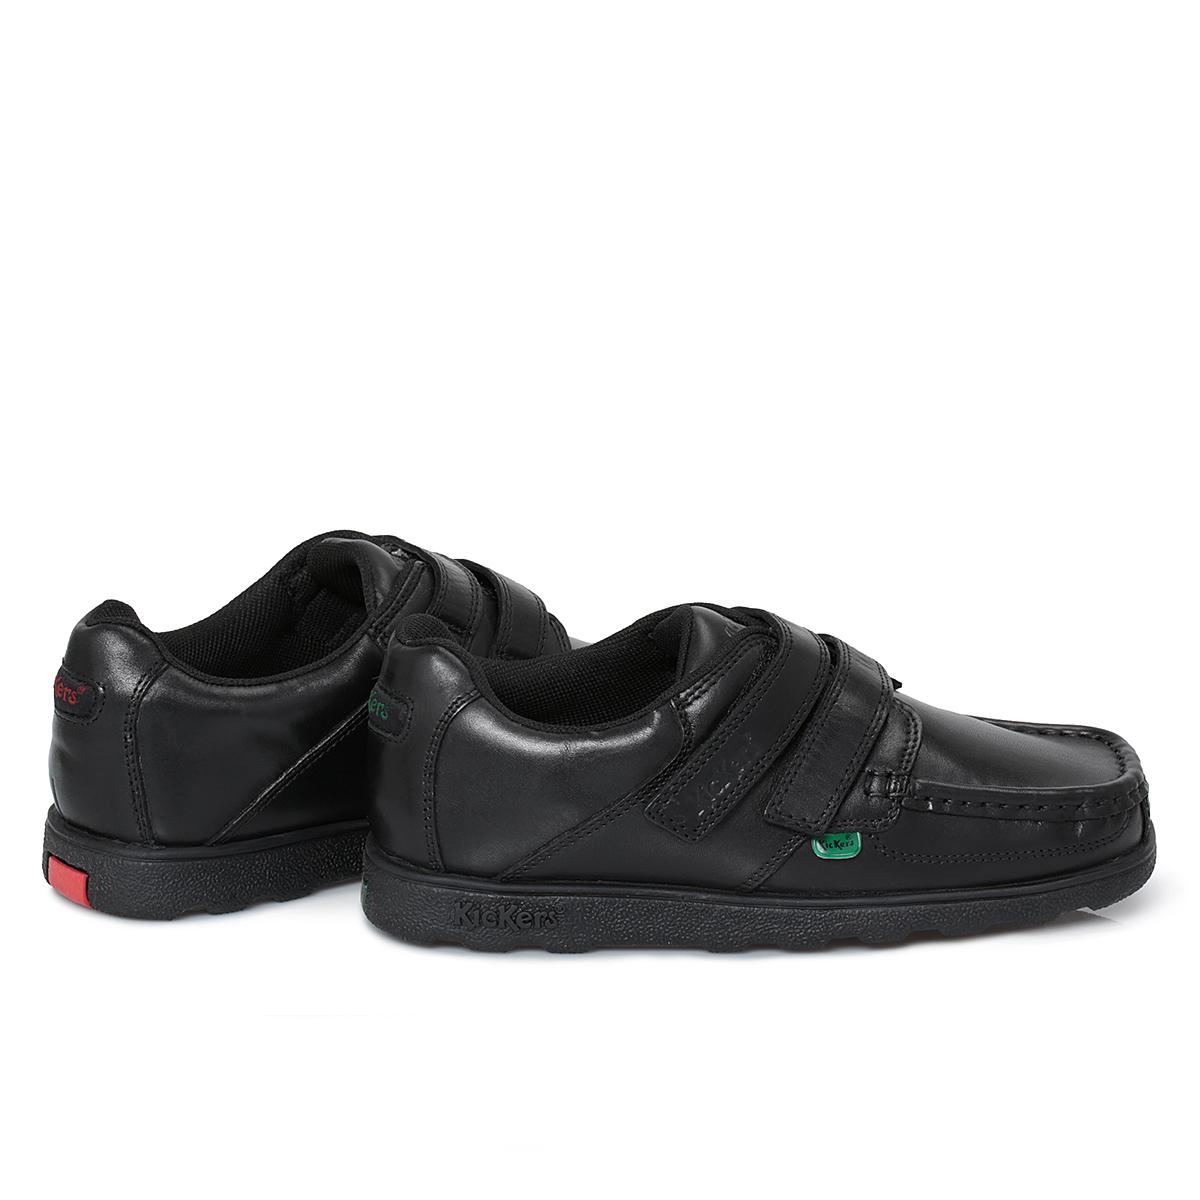 Kickers School Shoes Girls Velcro